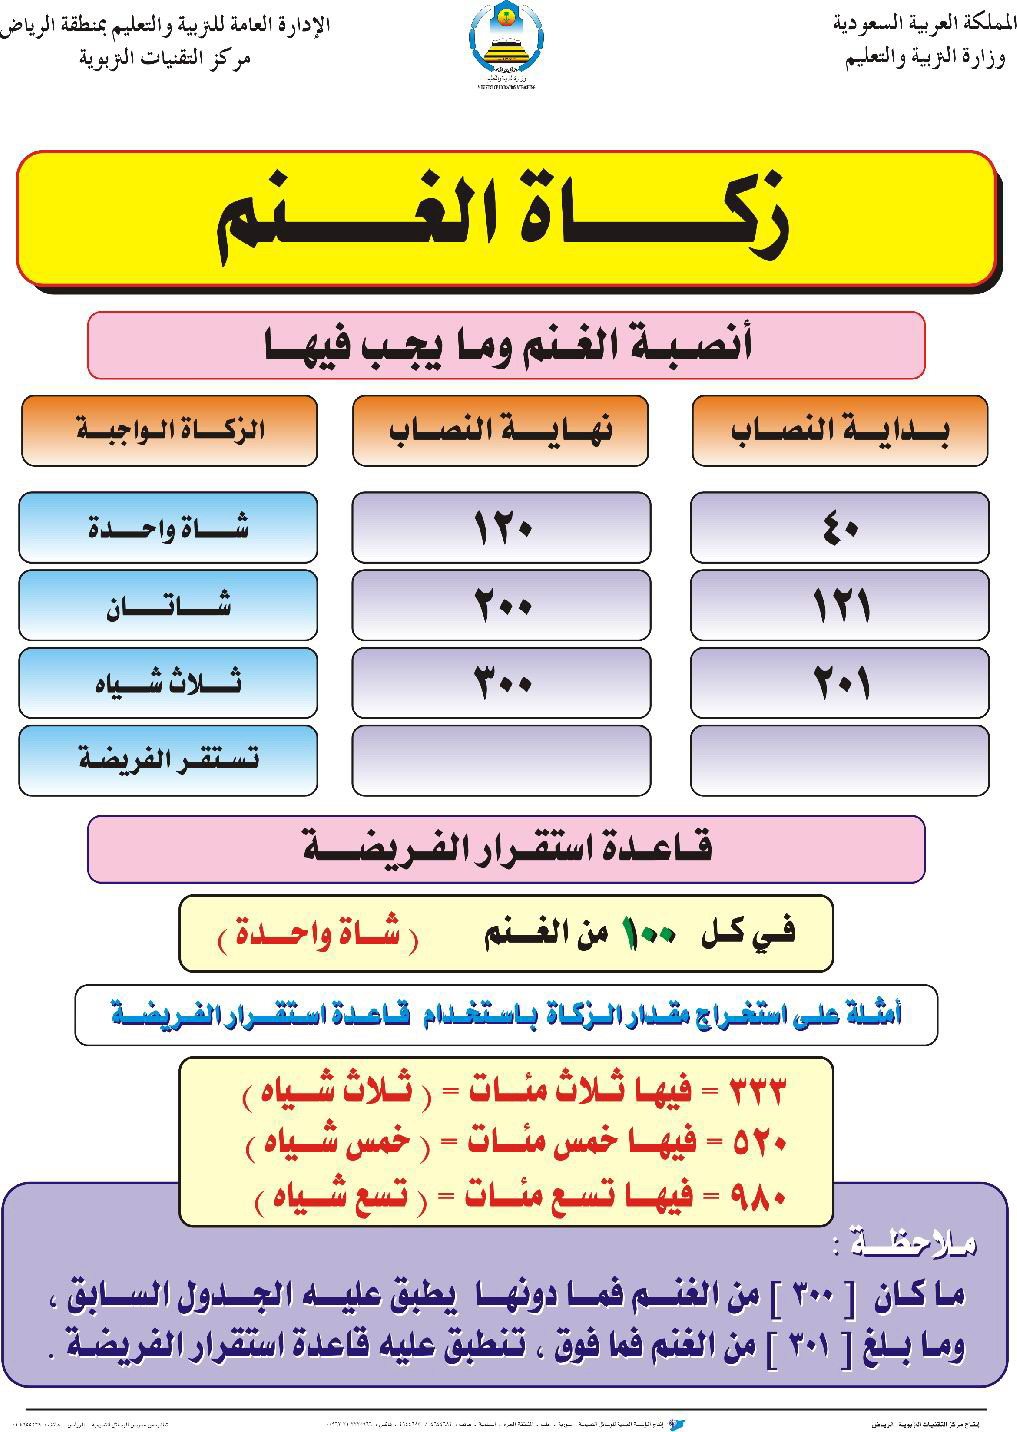 zakat system in islam